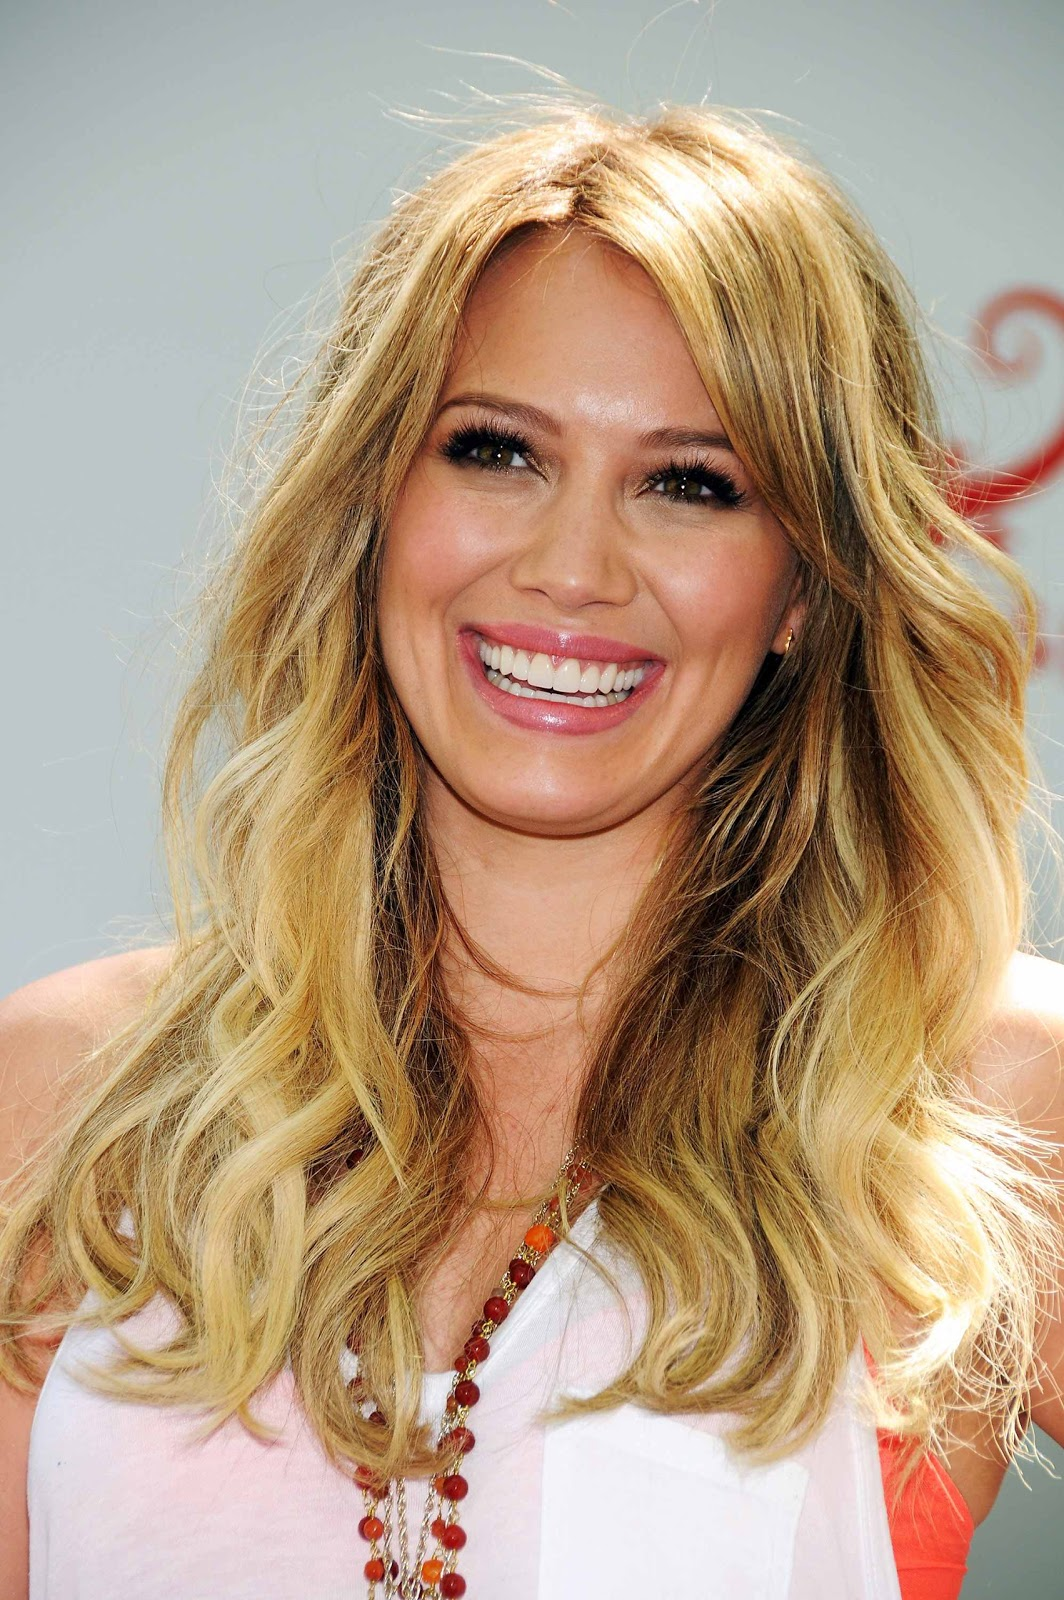 http://4.bp.blogspot.com/-m8KkV-gi6P8/TmFEQ27HXEI/AAAAAAAAAdo/StR0L87YWIw/s1600/Hilary-Duff-pics-films-photos-movies-lyrics-pictures-songs%2B%2525281%252529.jpg